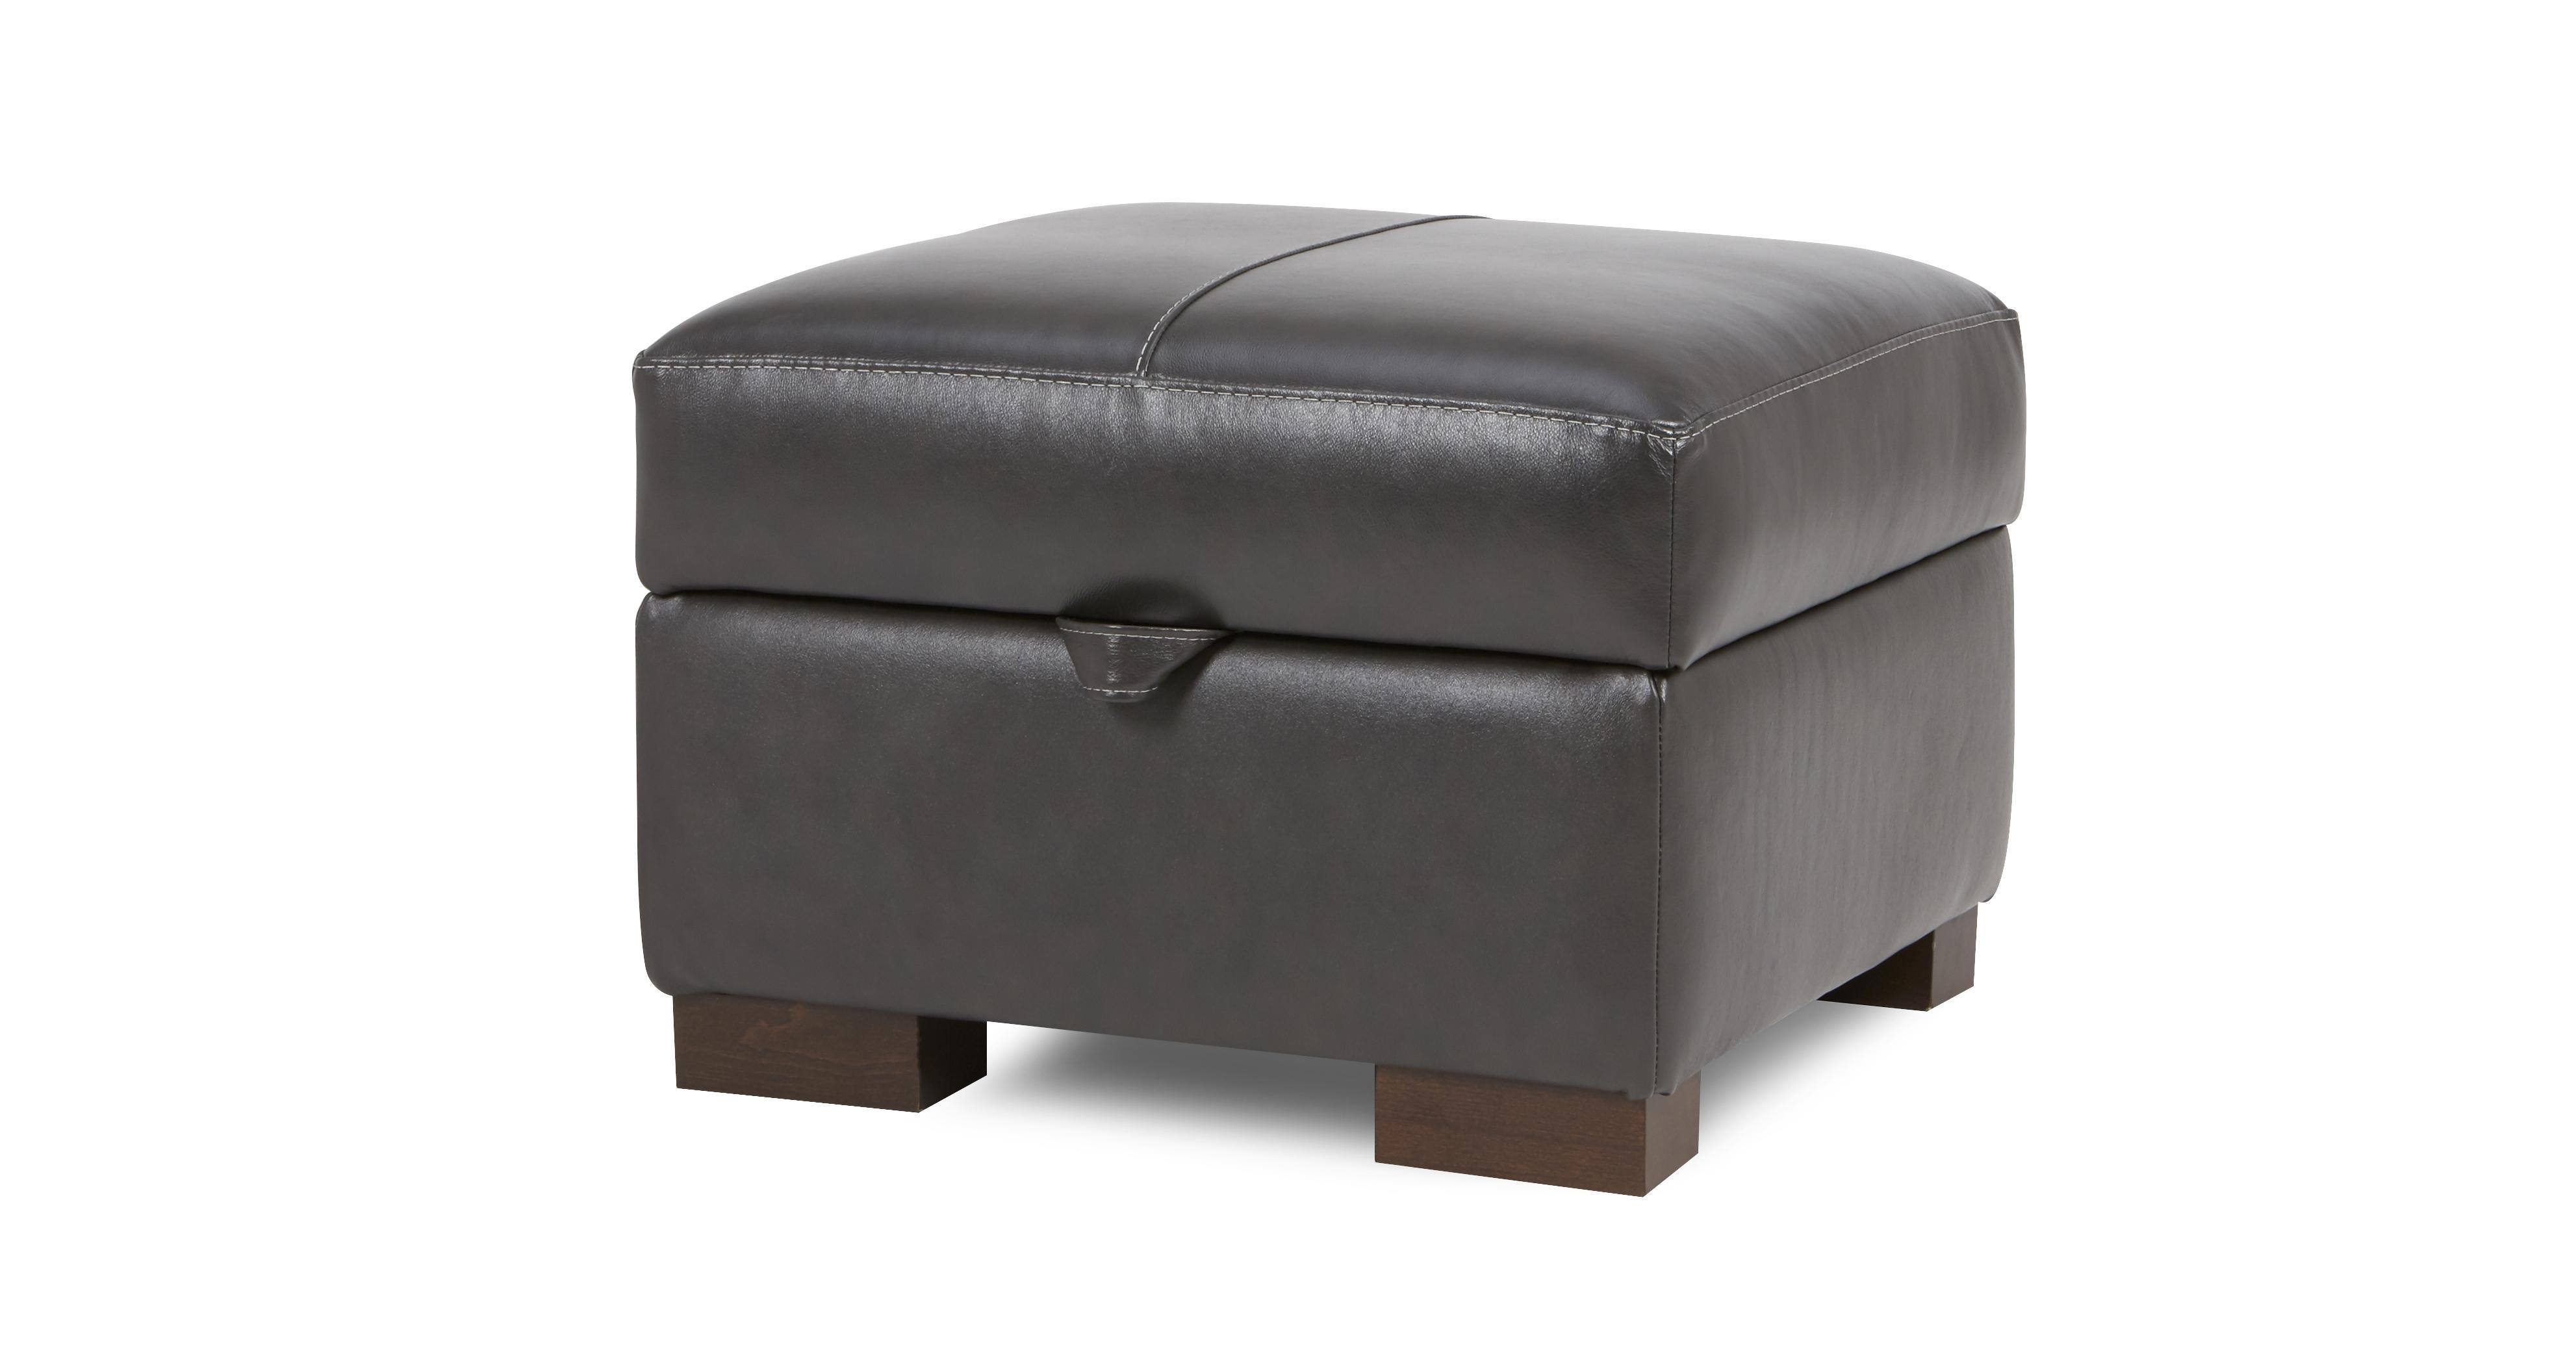 lodge sofa dfs black leather set designs clearance sofas sale ex display